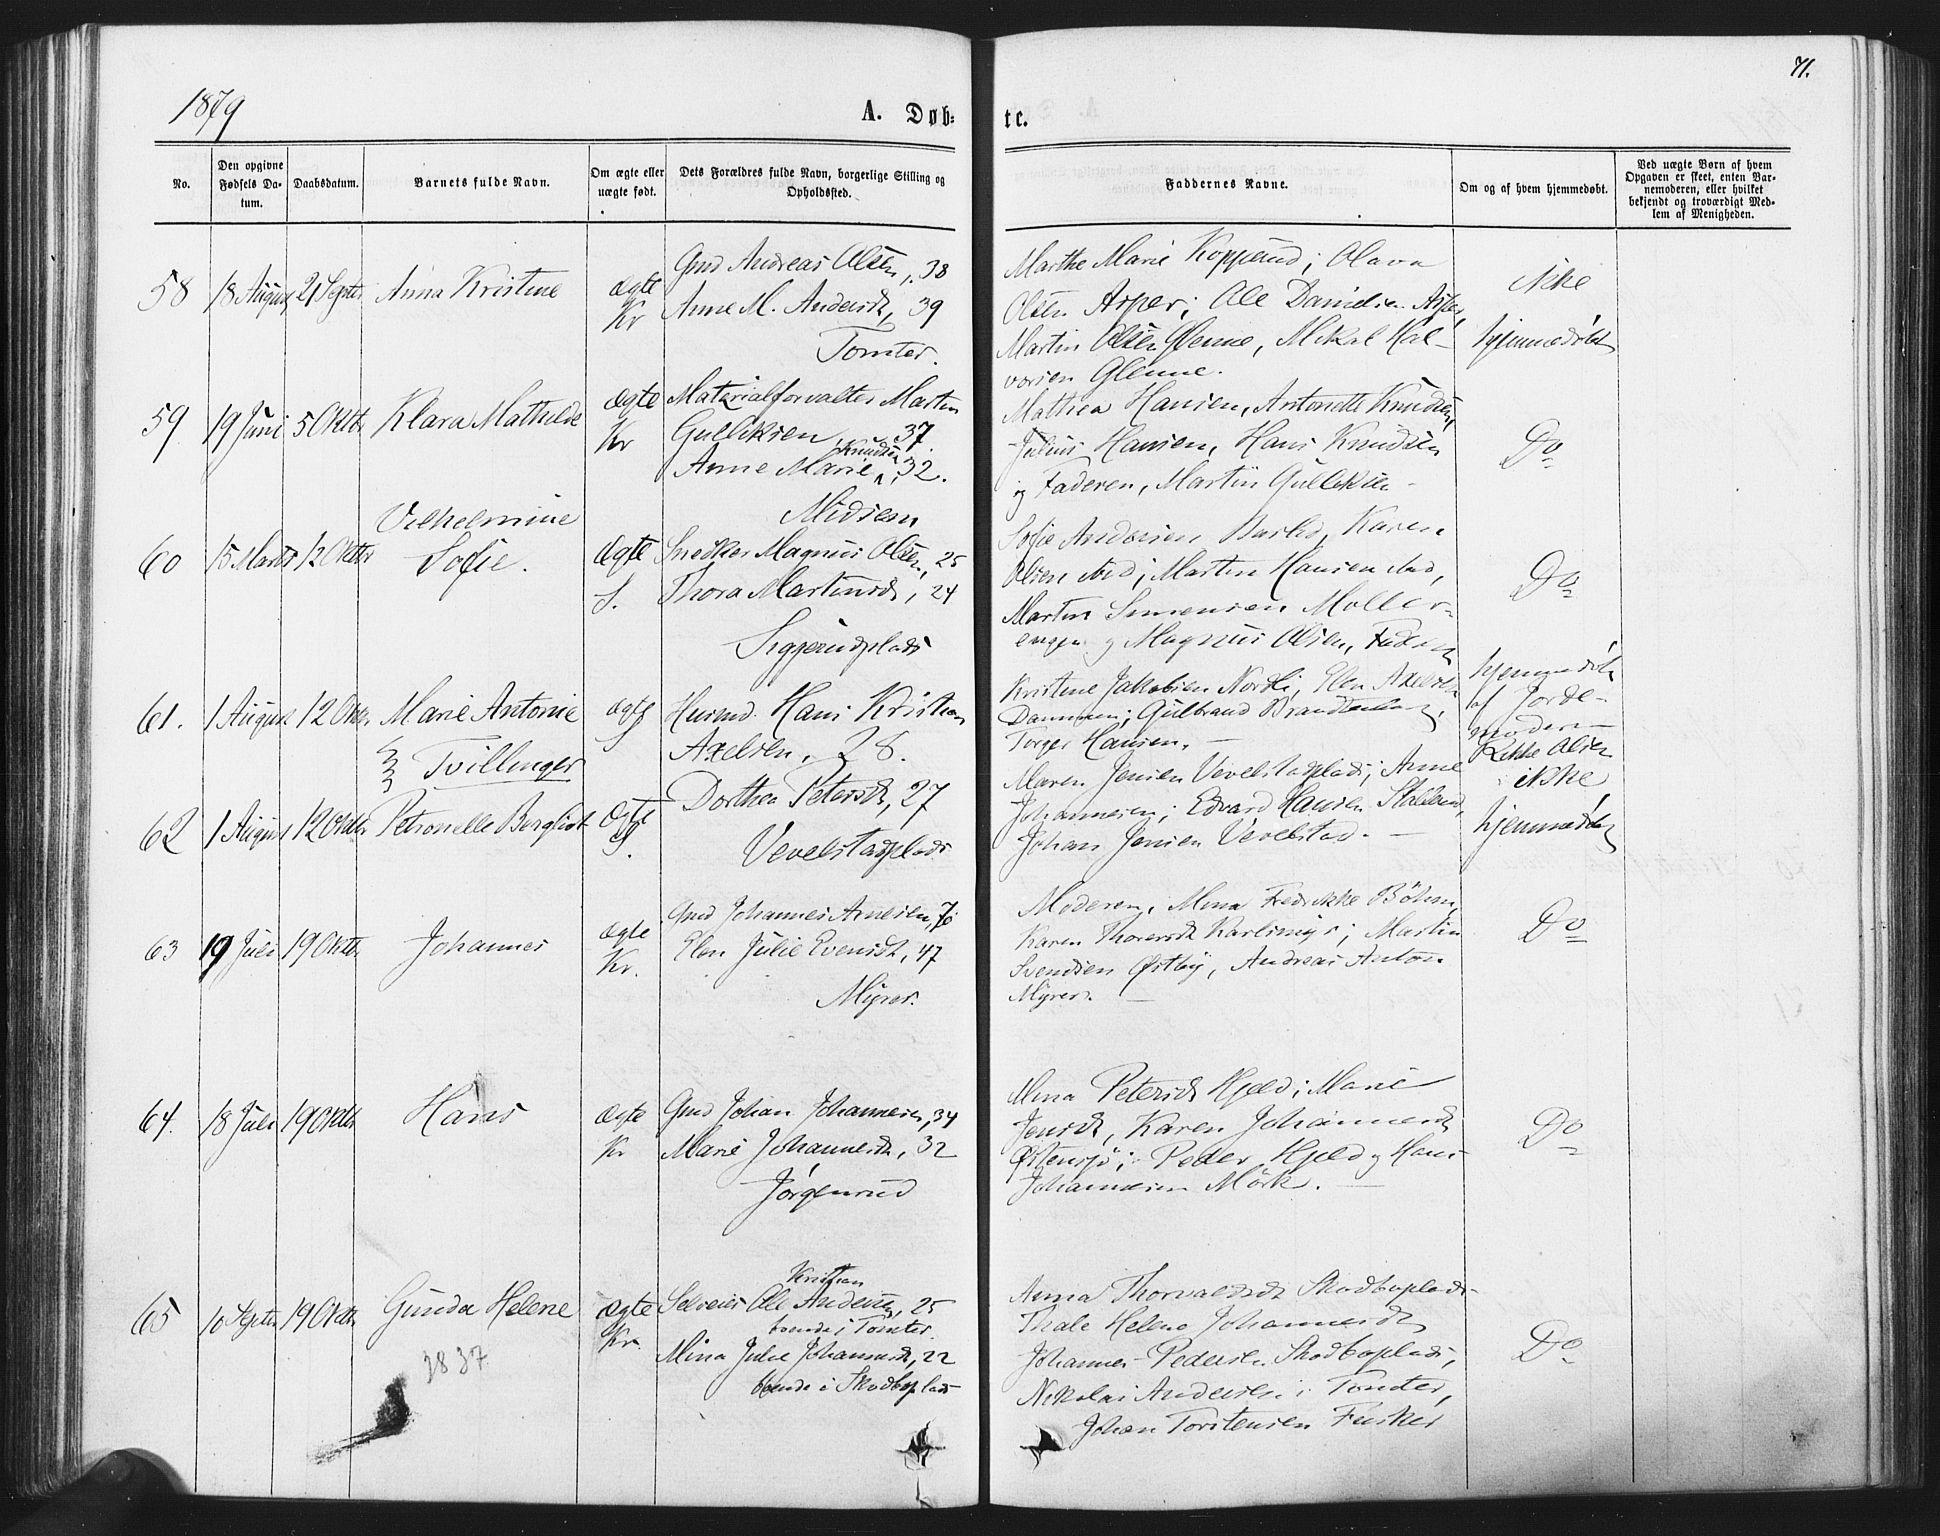 SAO, Kråkstad prestekontor Kirkebøker, F/Fa/L0008: Ministerialbok nr. I 8, 1870-1879, s. 71